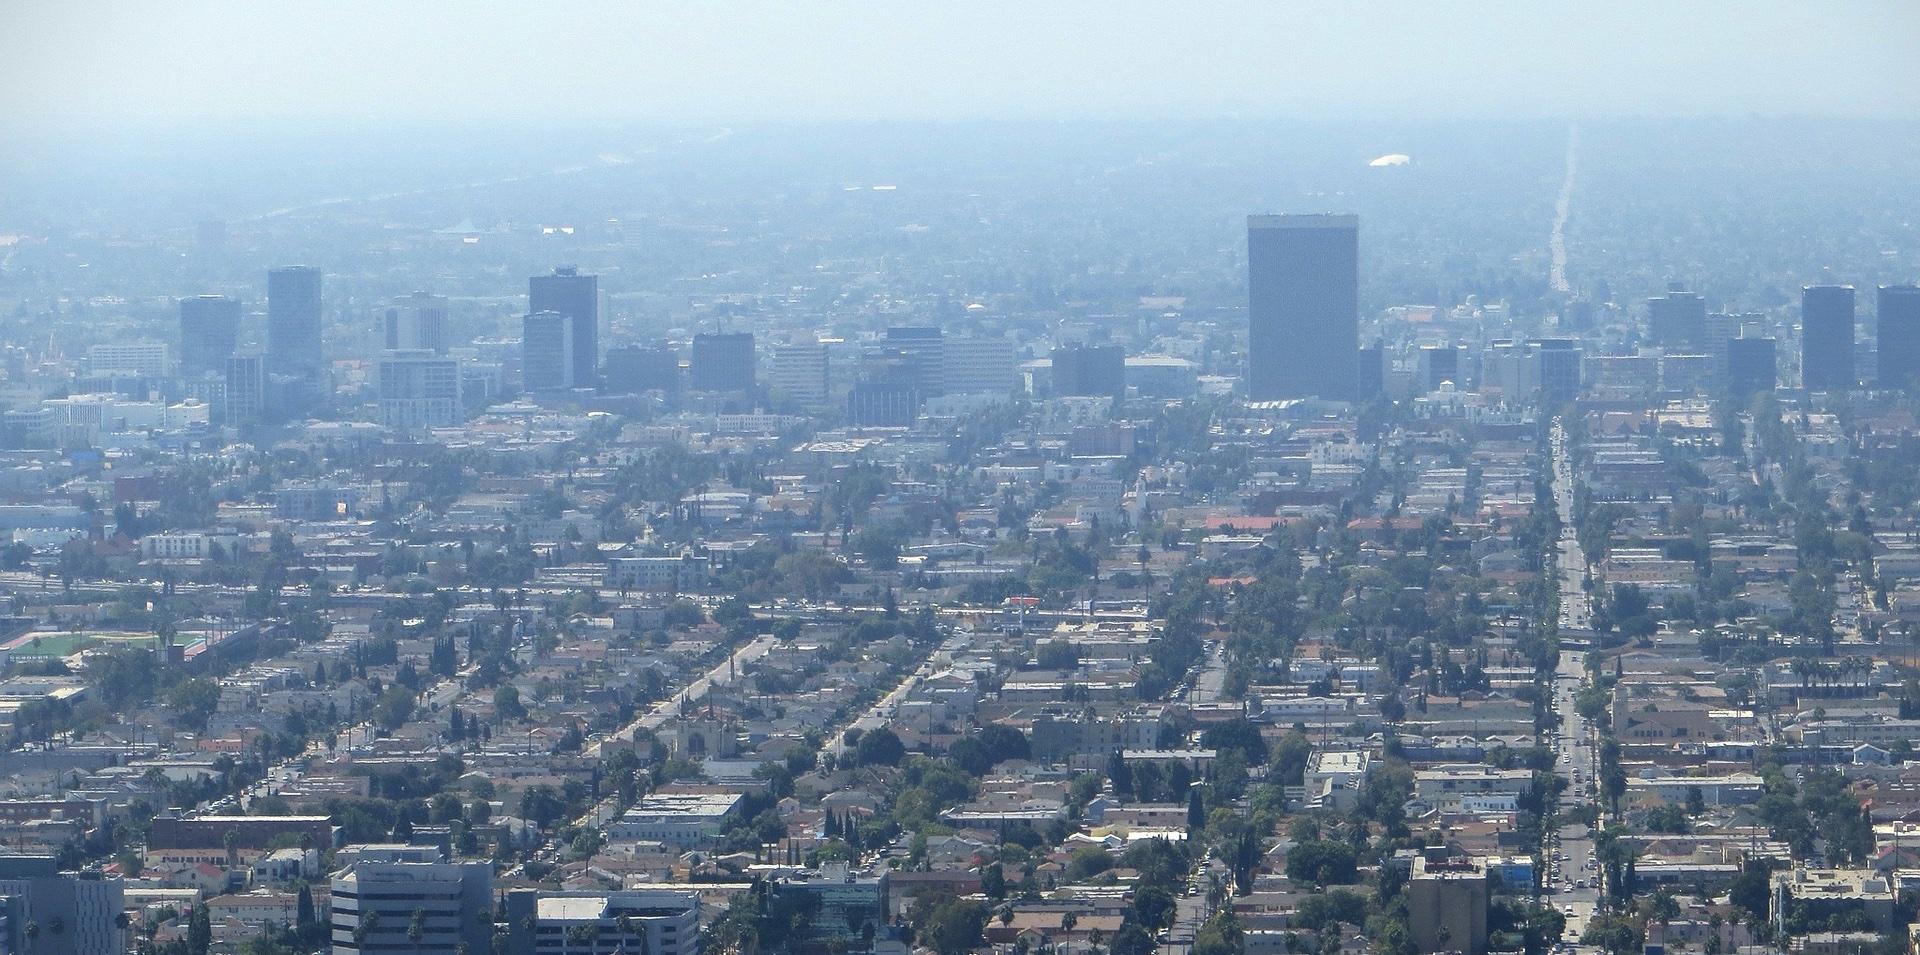 Report reveals worsening US air pollution, concerns over EPA weakening emissions regulations